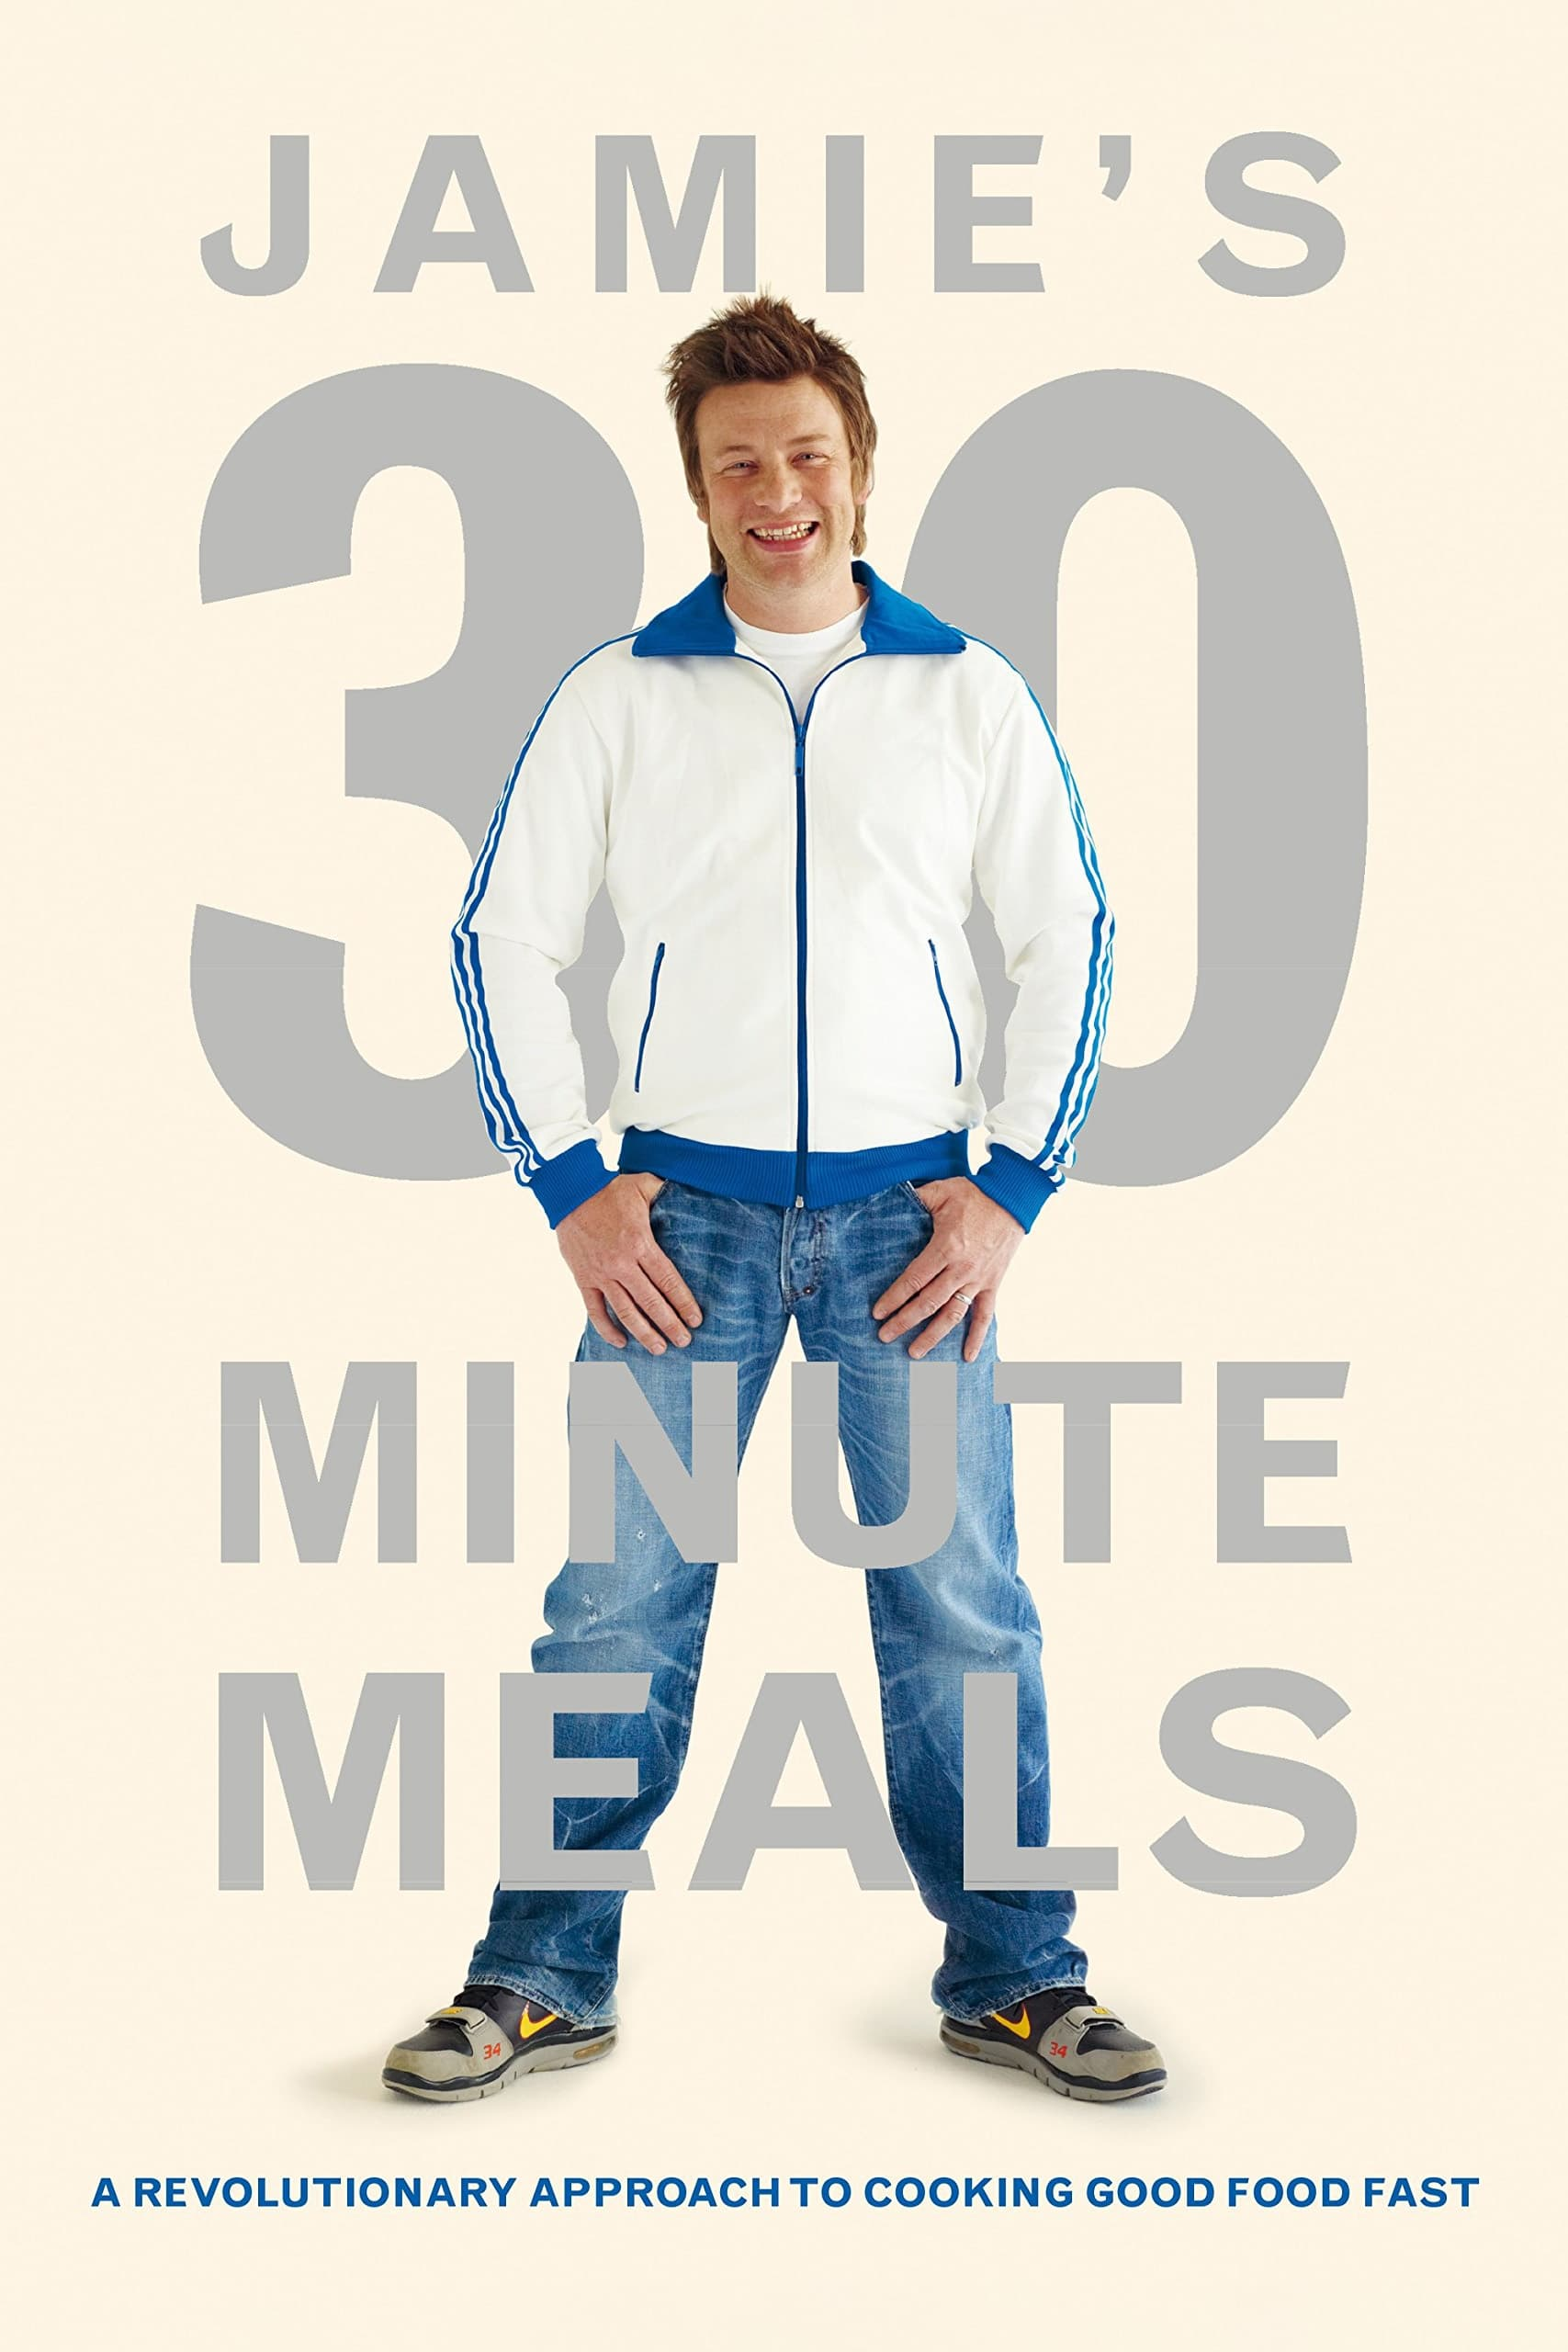 Jamie's 30 Minute Meals (2010)